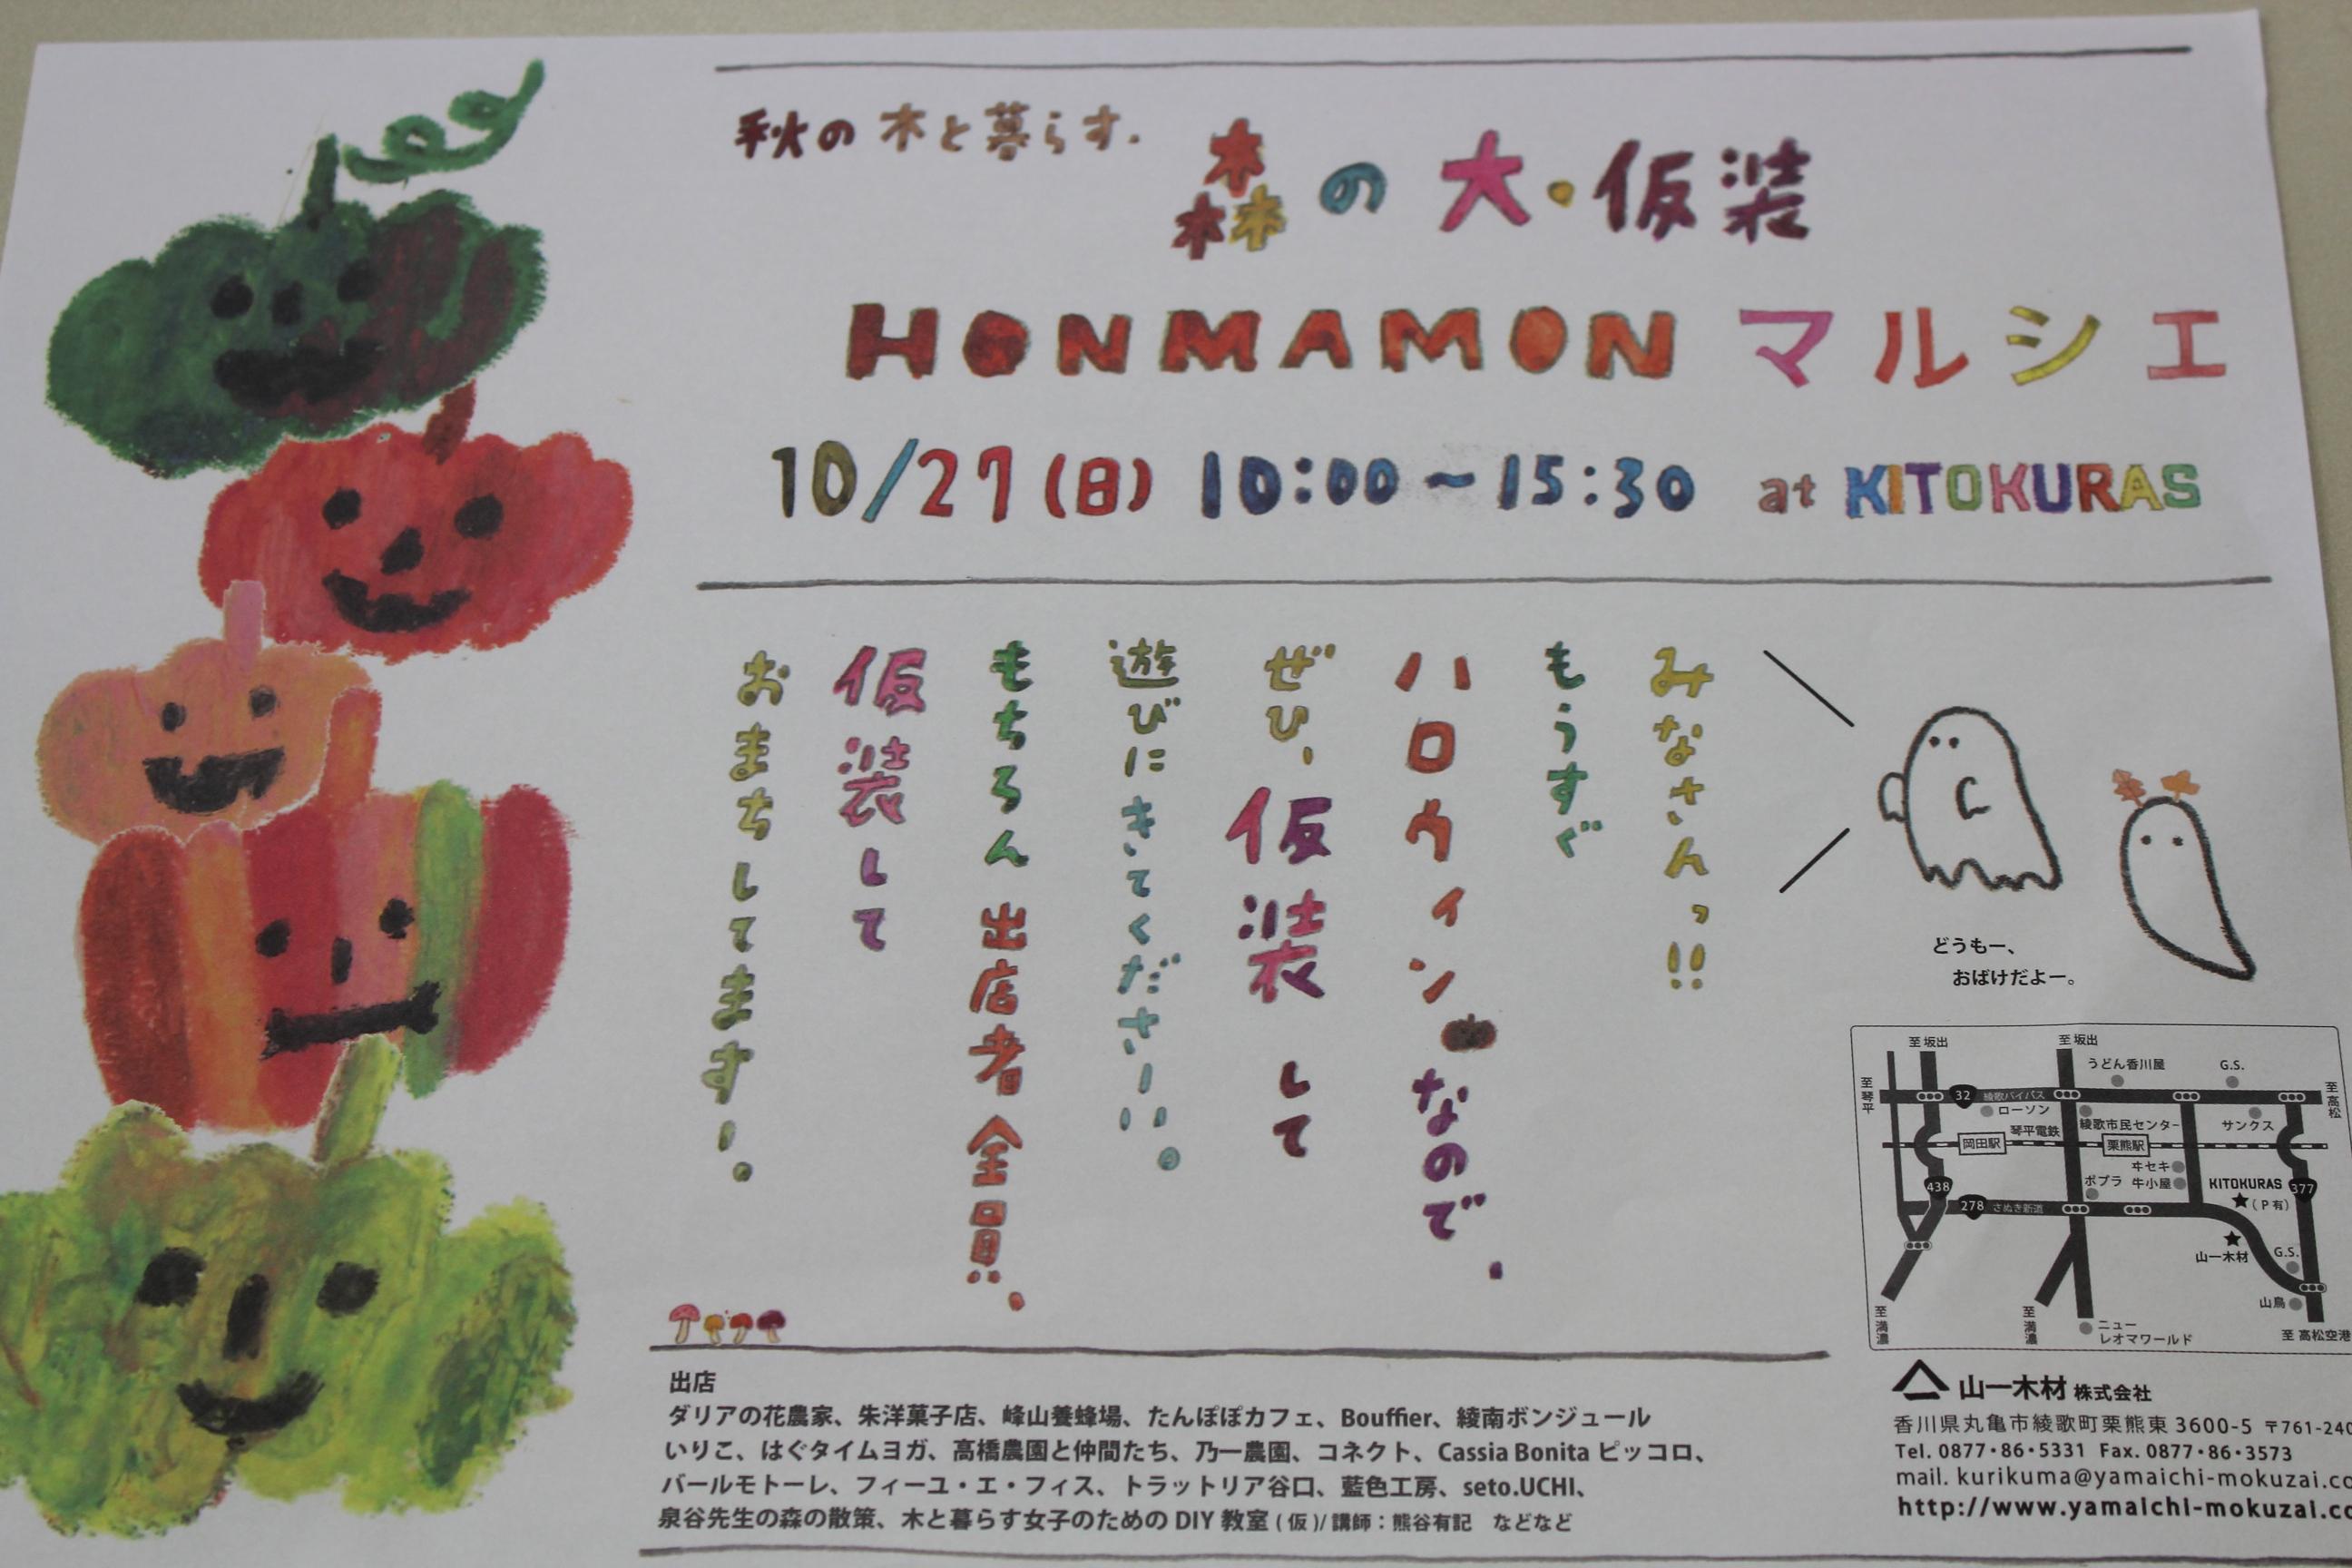 HONMAMON